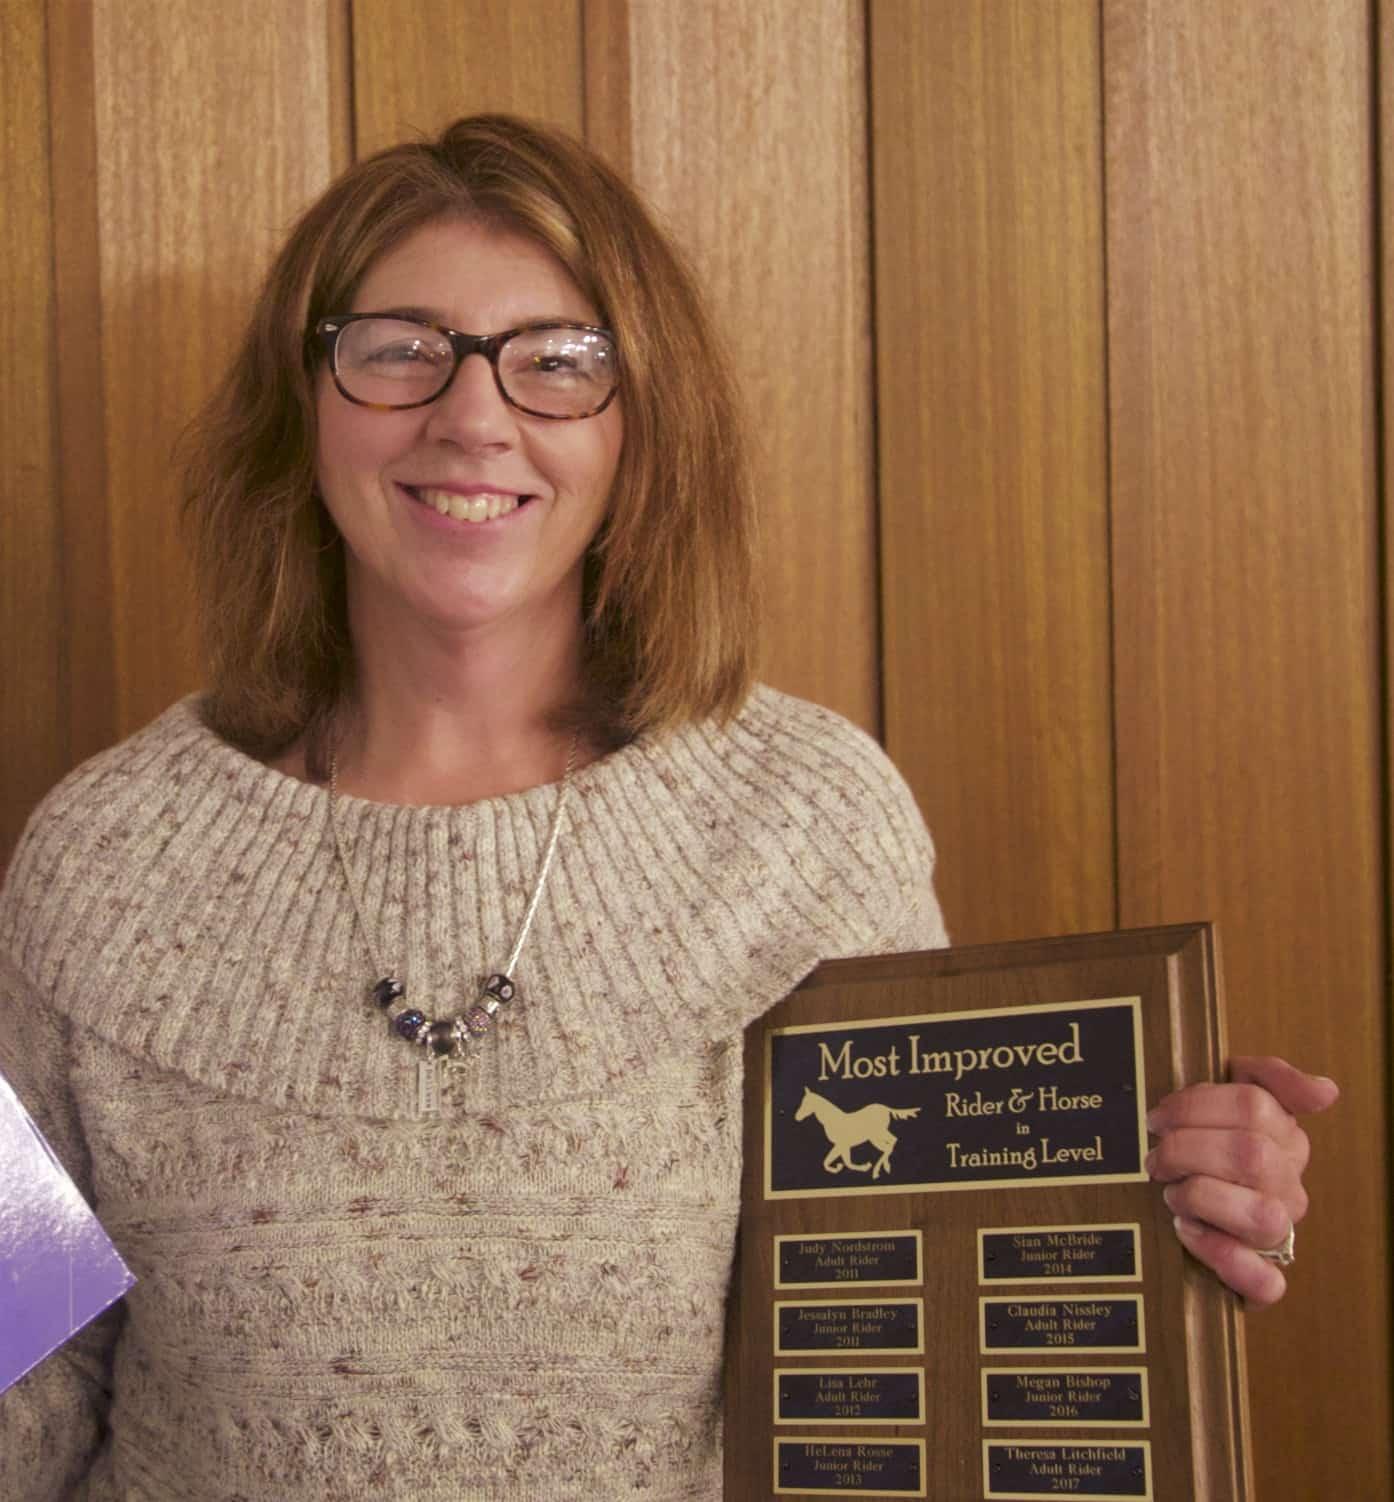 Teresa Litchfield, 2017 Most Improved Adult at Training Level